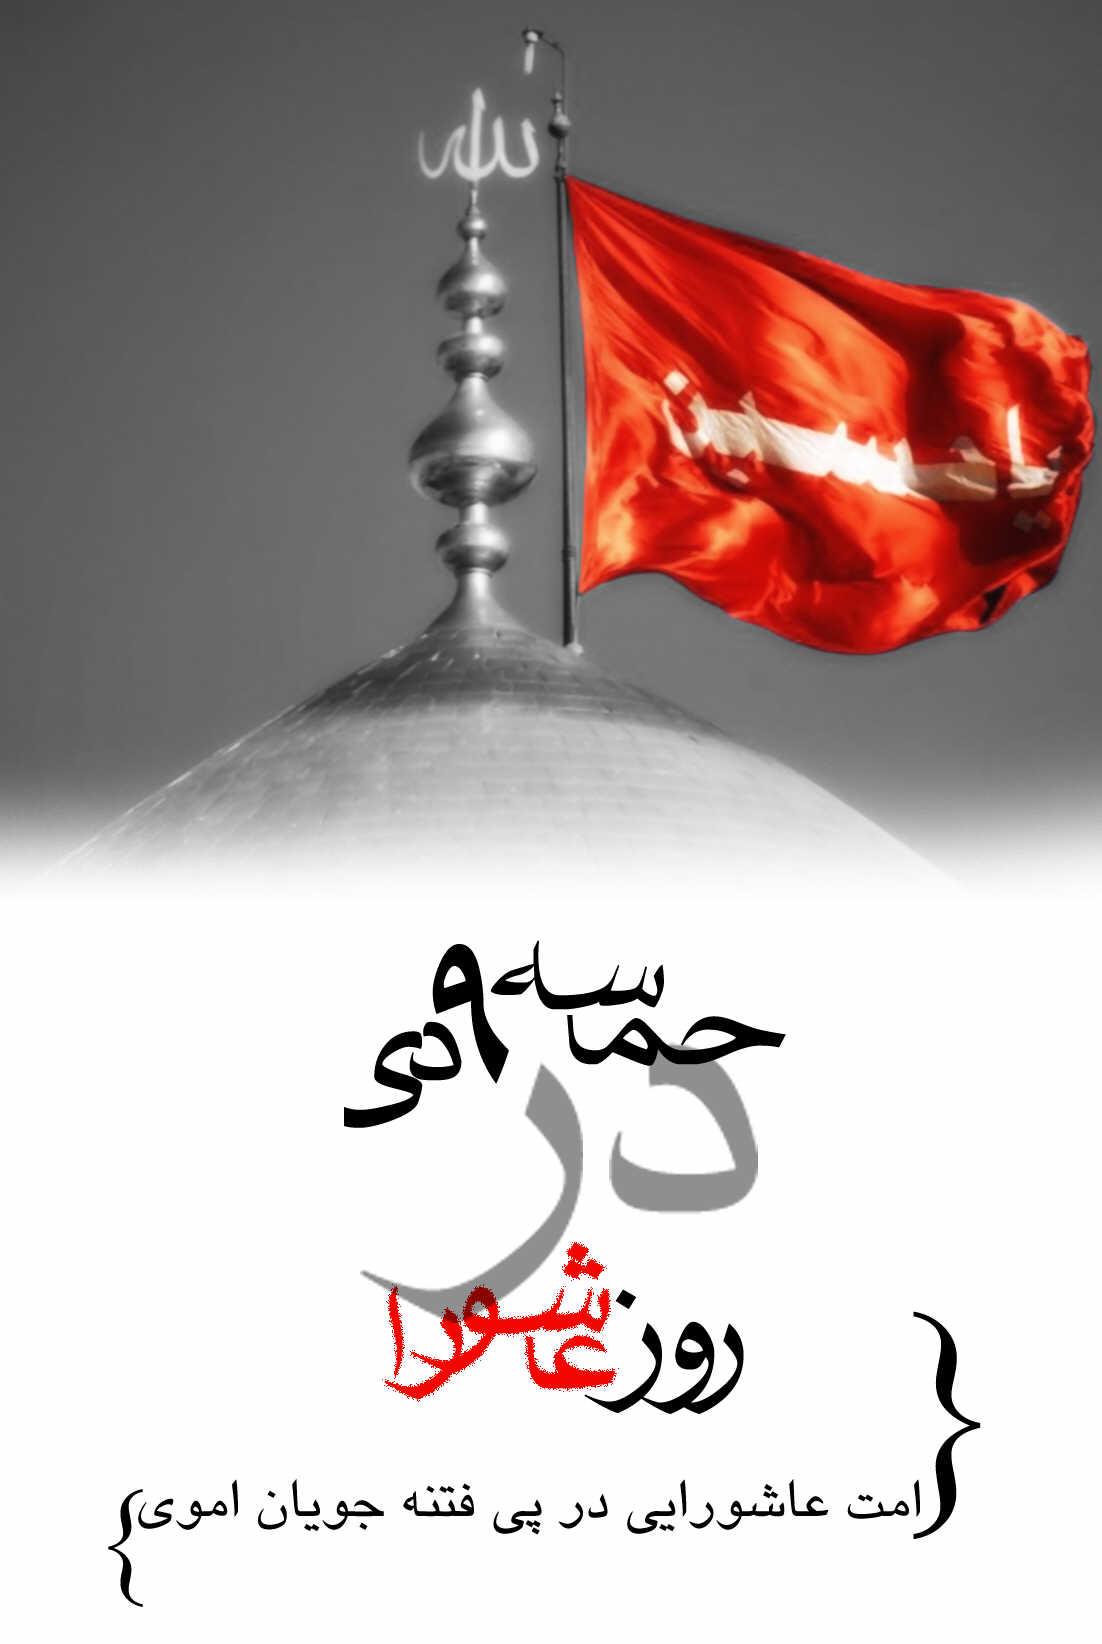 http://www.asr-entezar.ir/9dey/wp-content/uploads/ASHURA-NEW.jpg